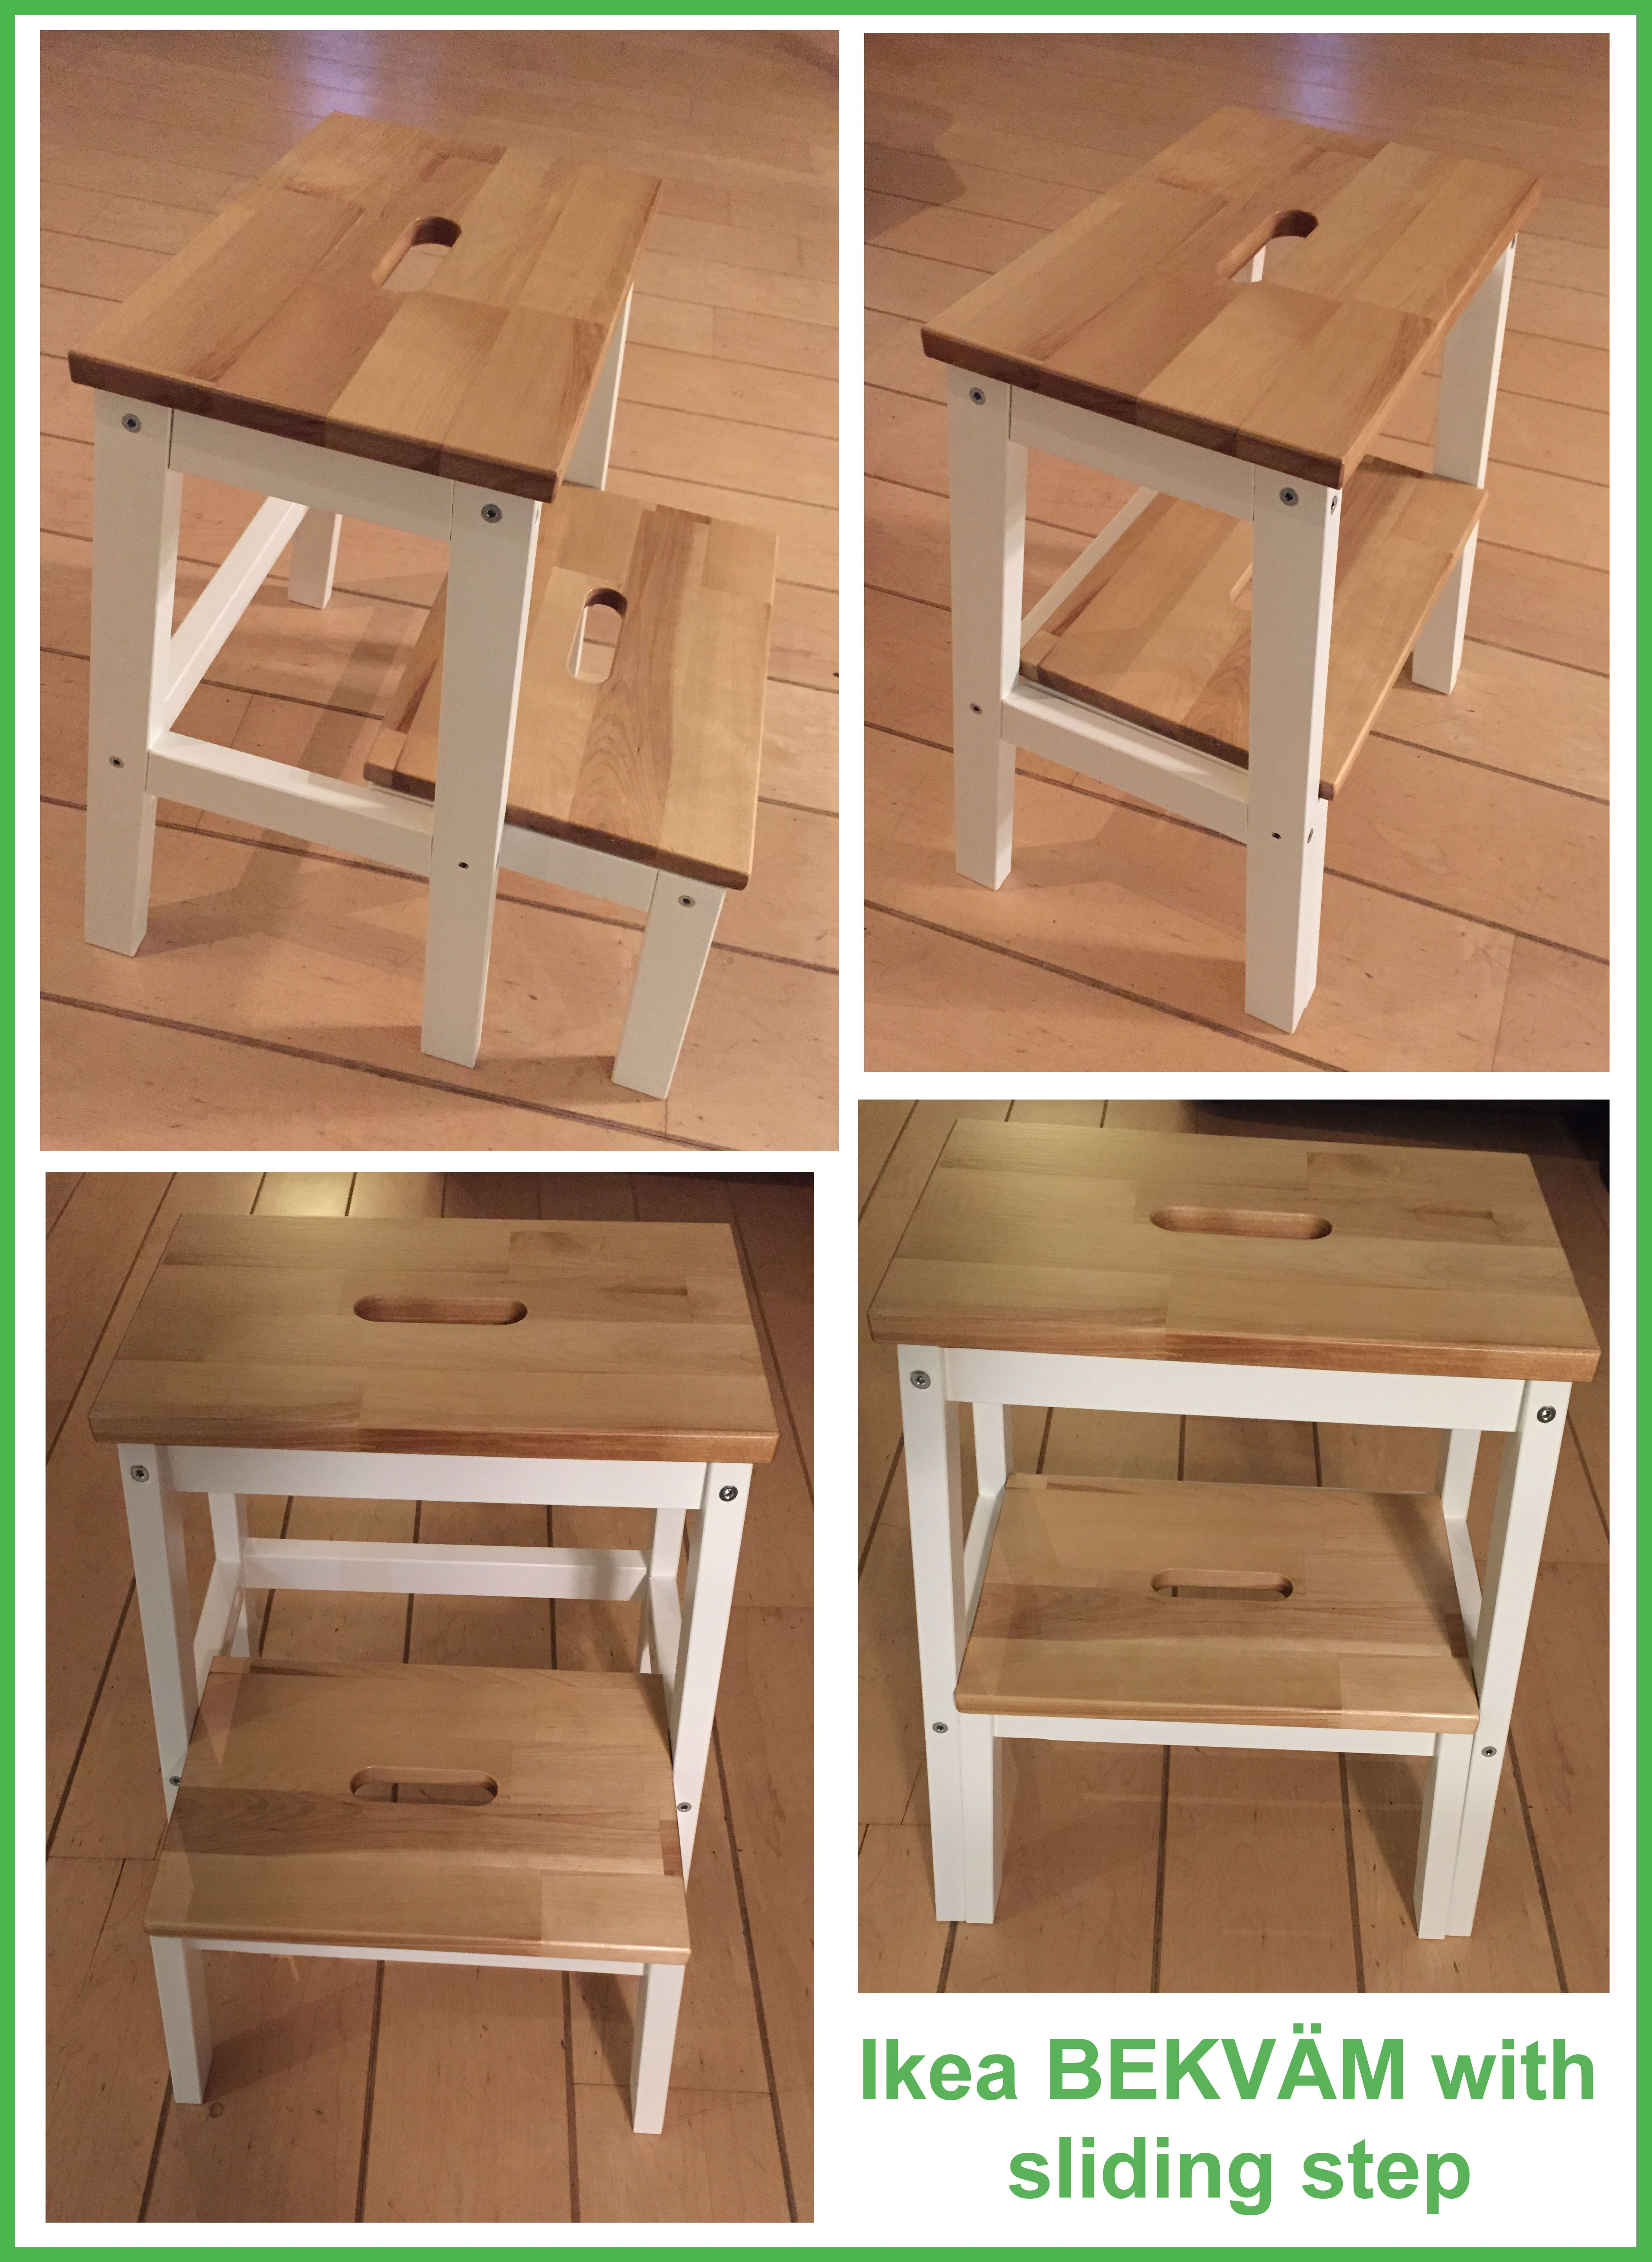 Uberlegen Ikea BEKVÄM Hack; 2 Stools Became 1 Stool With A Sliding Bottom Step To  Safe Space. (like The DANIA STEPLADDER BY SKAGERAK) Van Twee Ikea BEKVÄM  Opstapjes ...